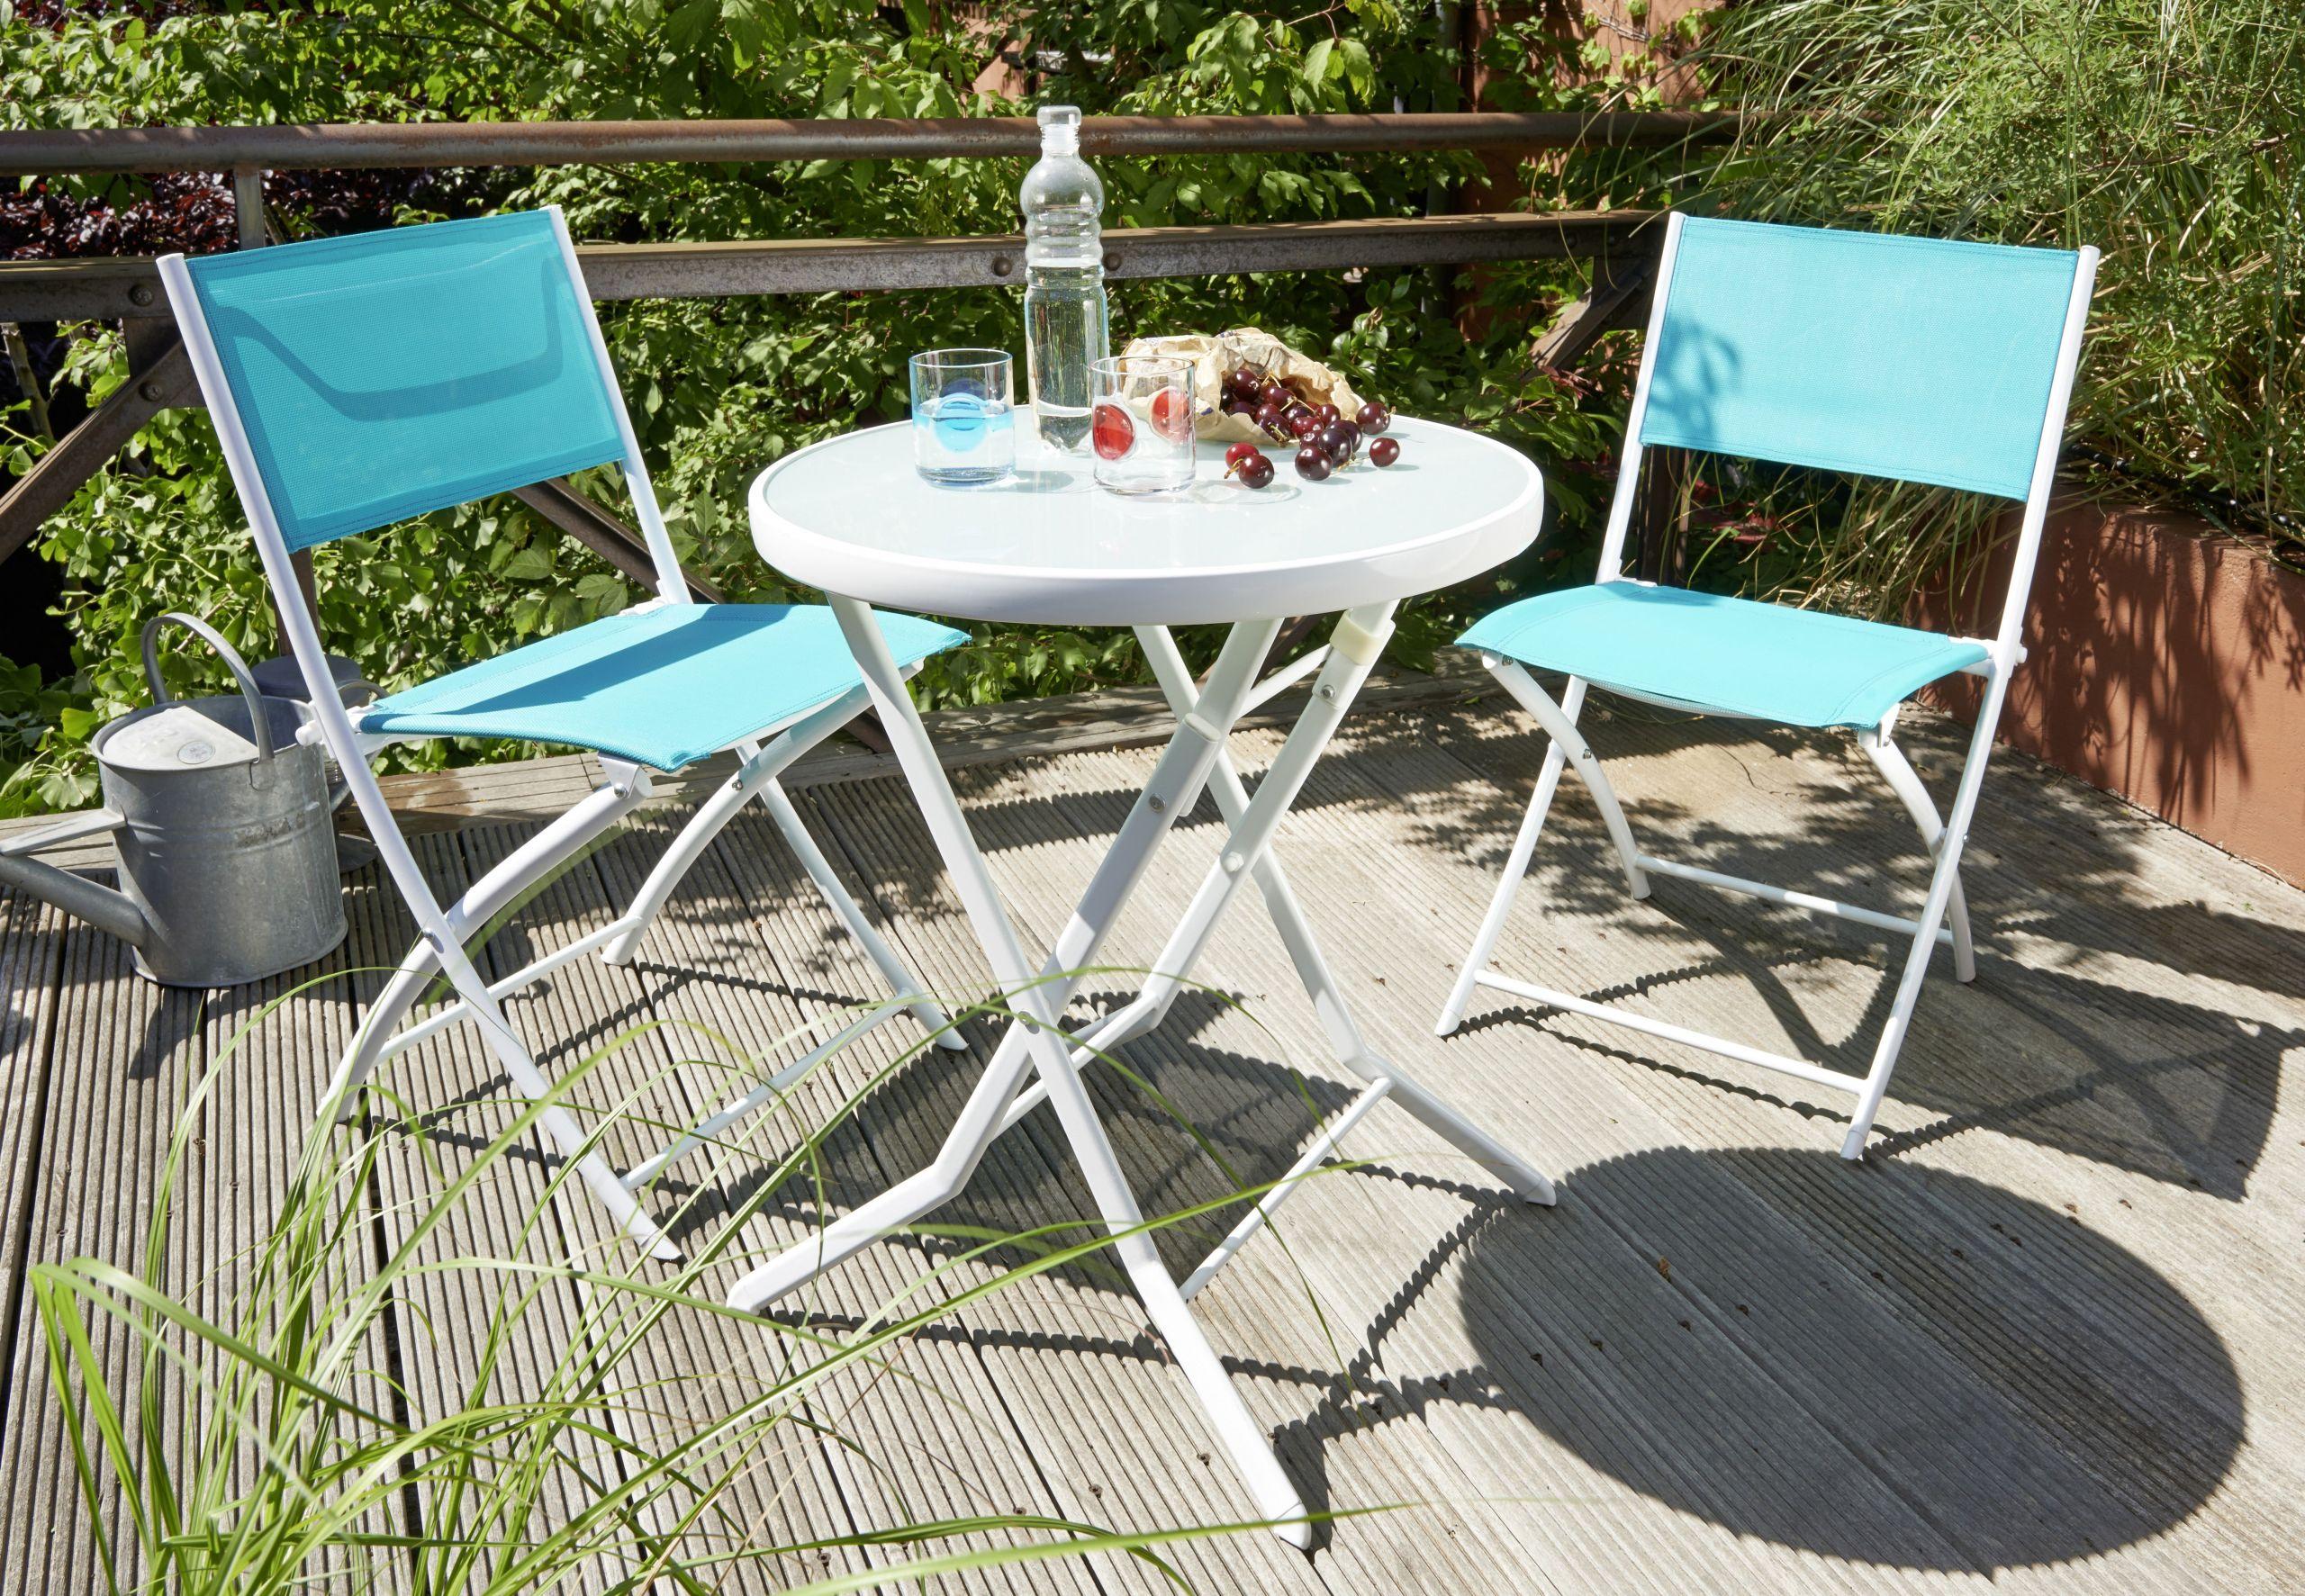 40 Inspirant Table Exterieur Carrefour | Salon Jardin concernant Abris De Jardin Carrefour